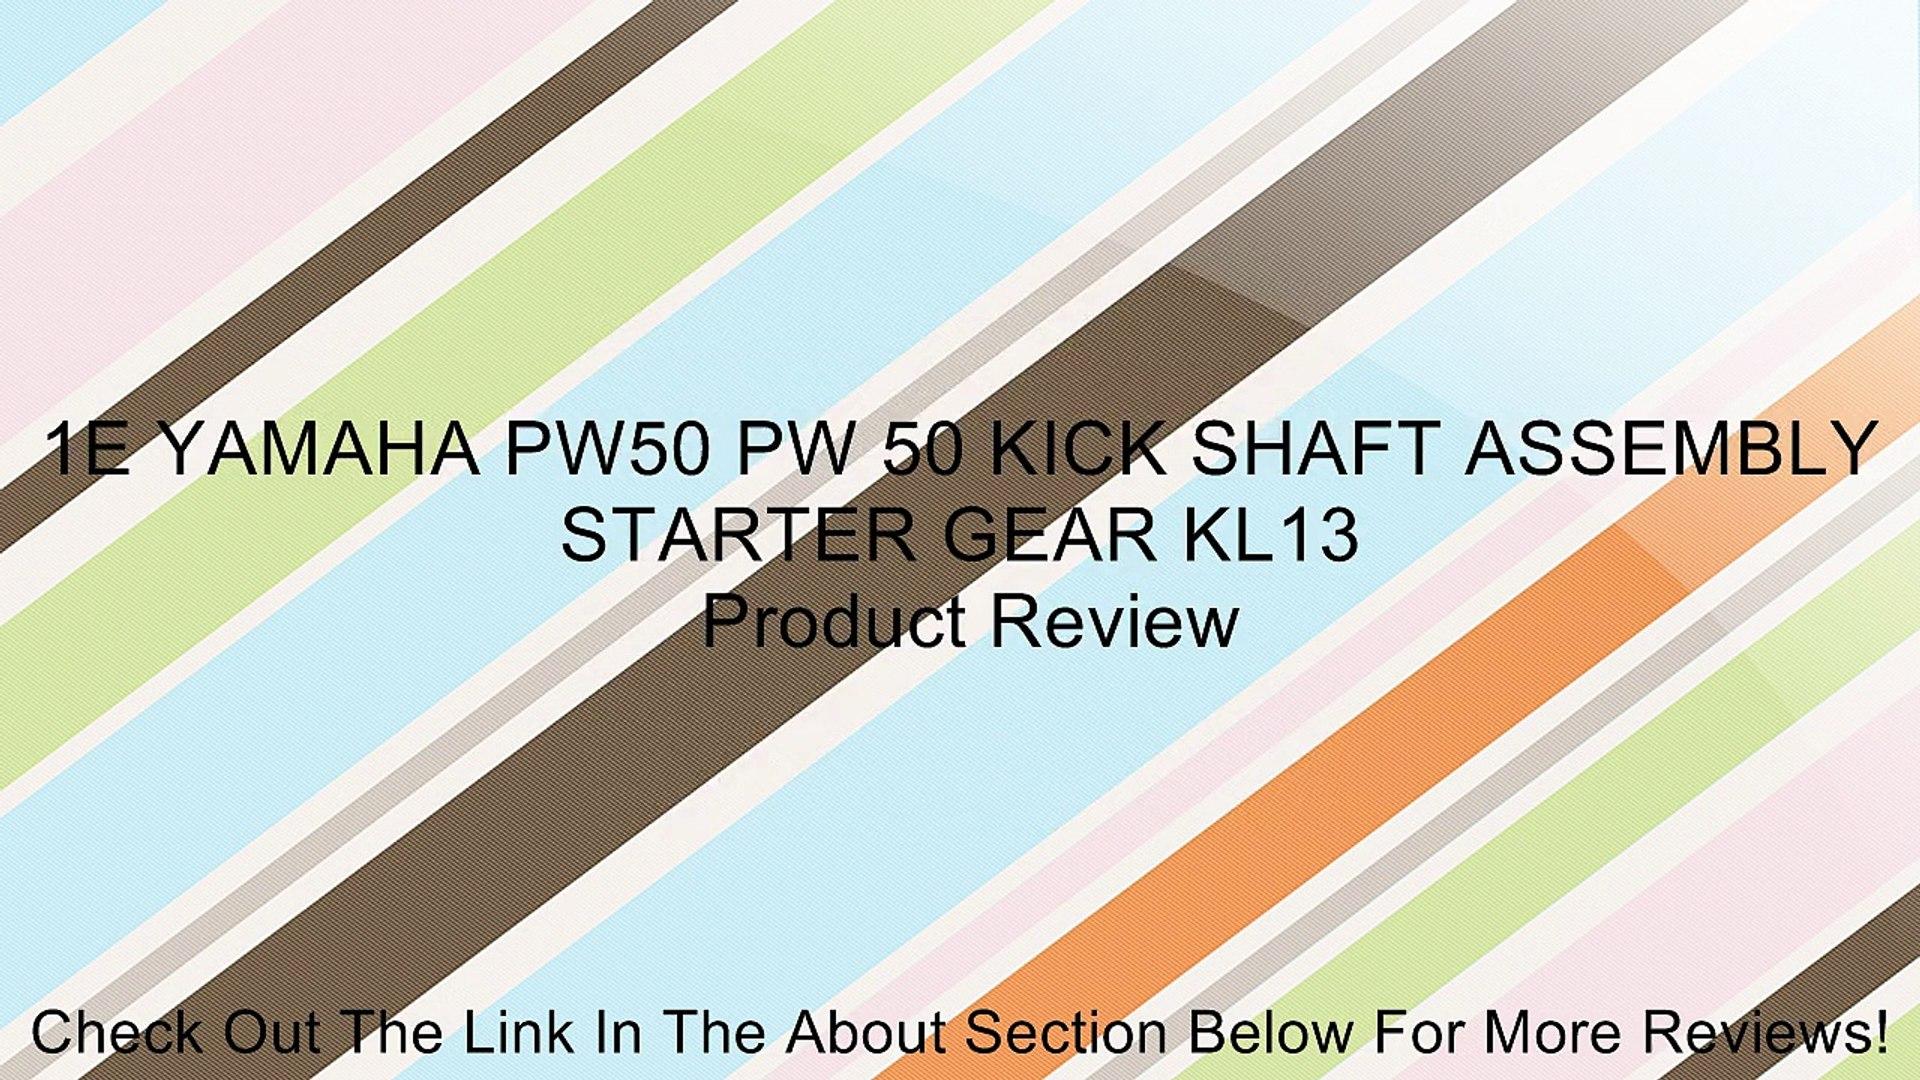 KICK SHAFT ASSEMBLY STARTER GEAR FOR YAMAHA PW50 PW 50 Dirt bike